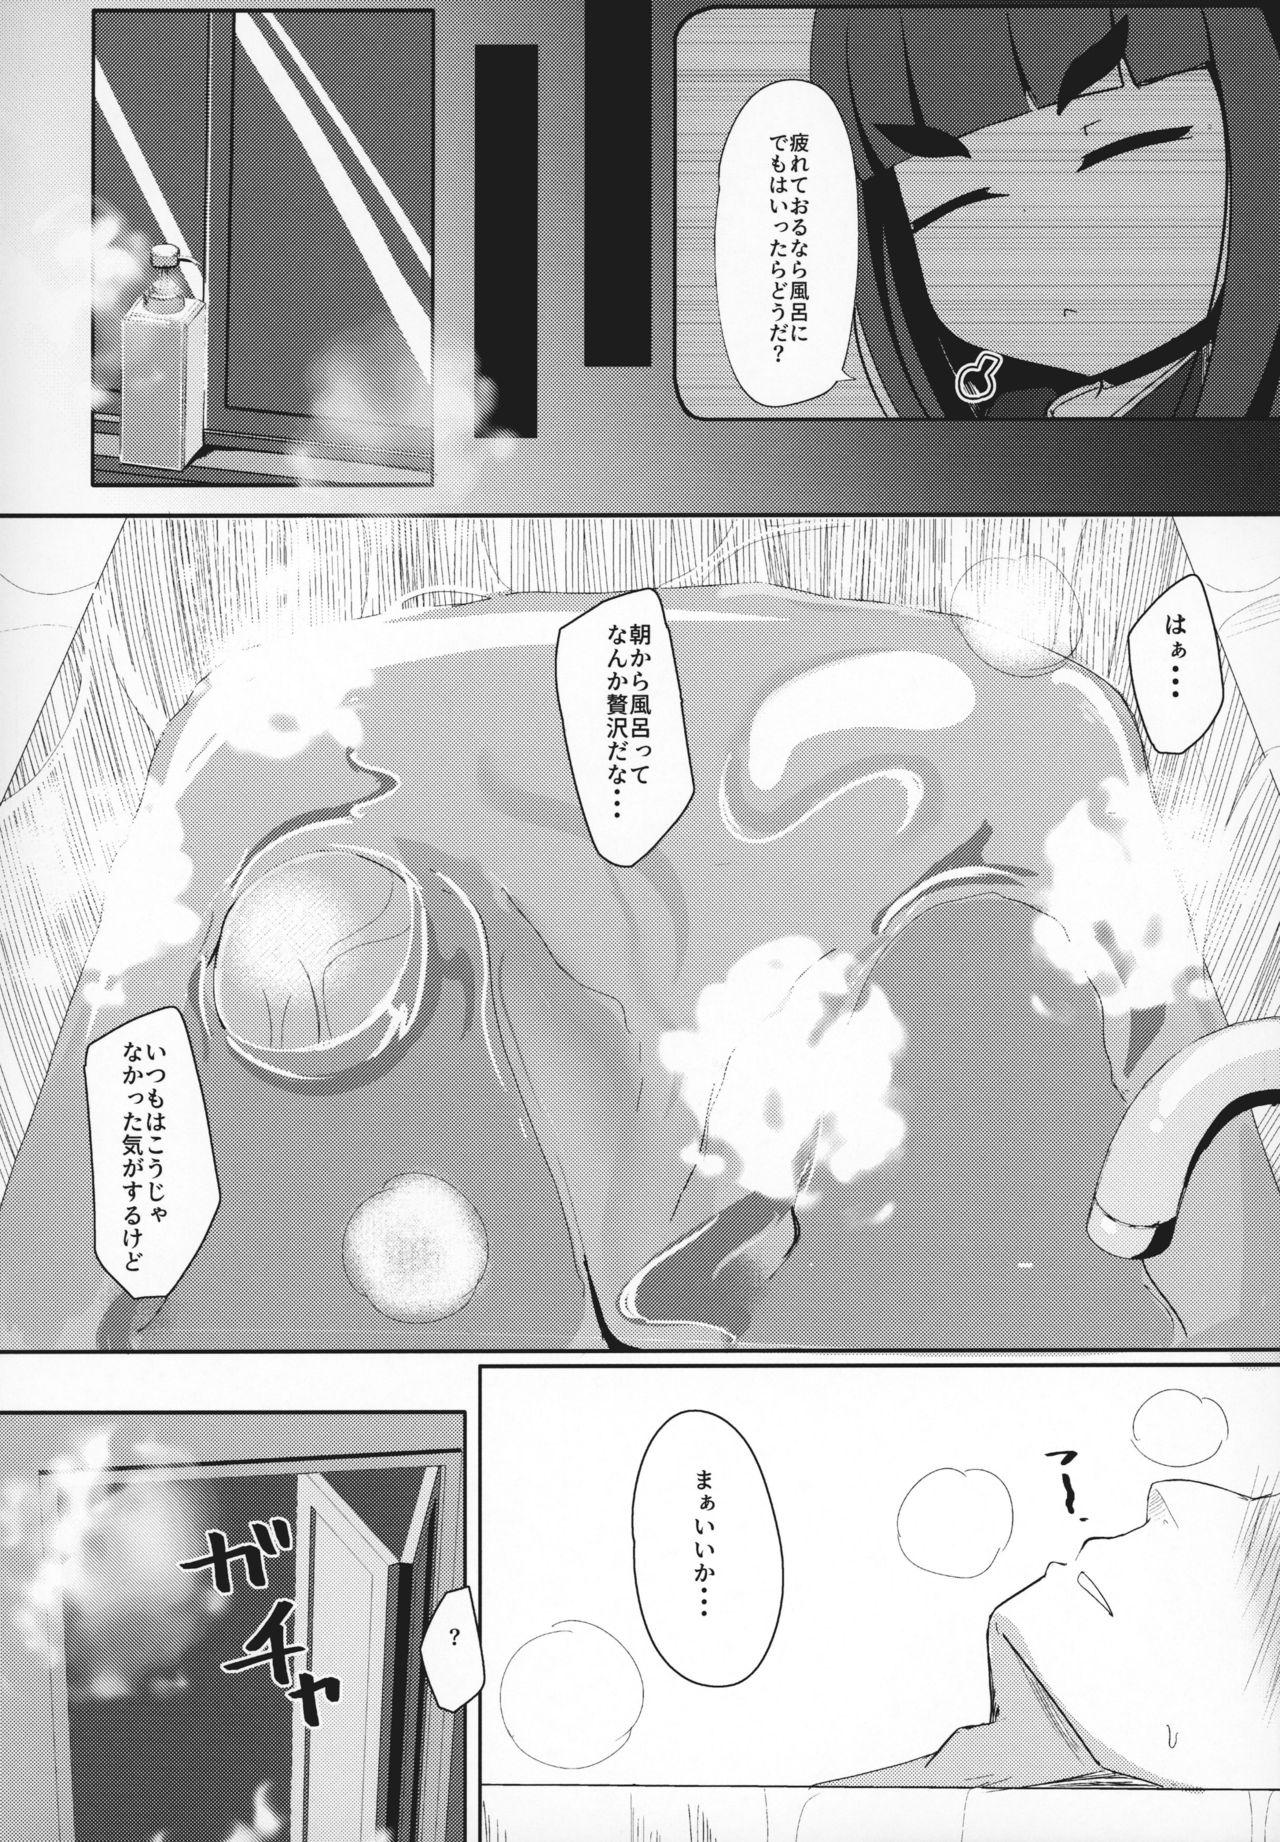 (COMITIA127) [Manpuchi (Nekodel)] Uro -Makuai- Kanwa 11